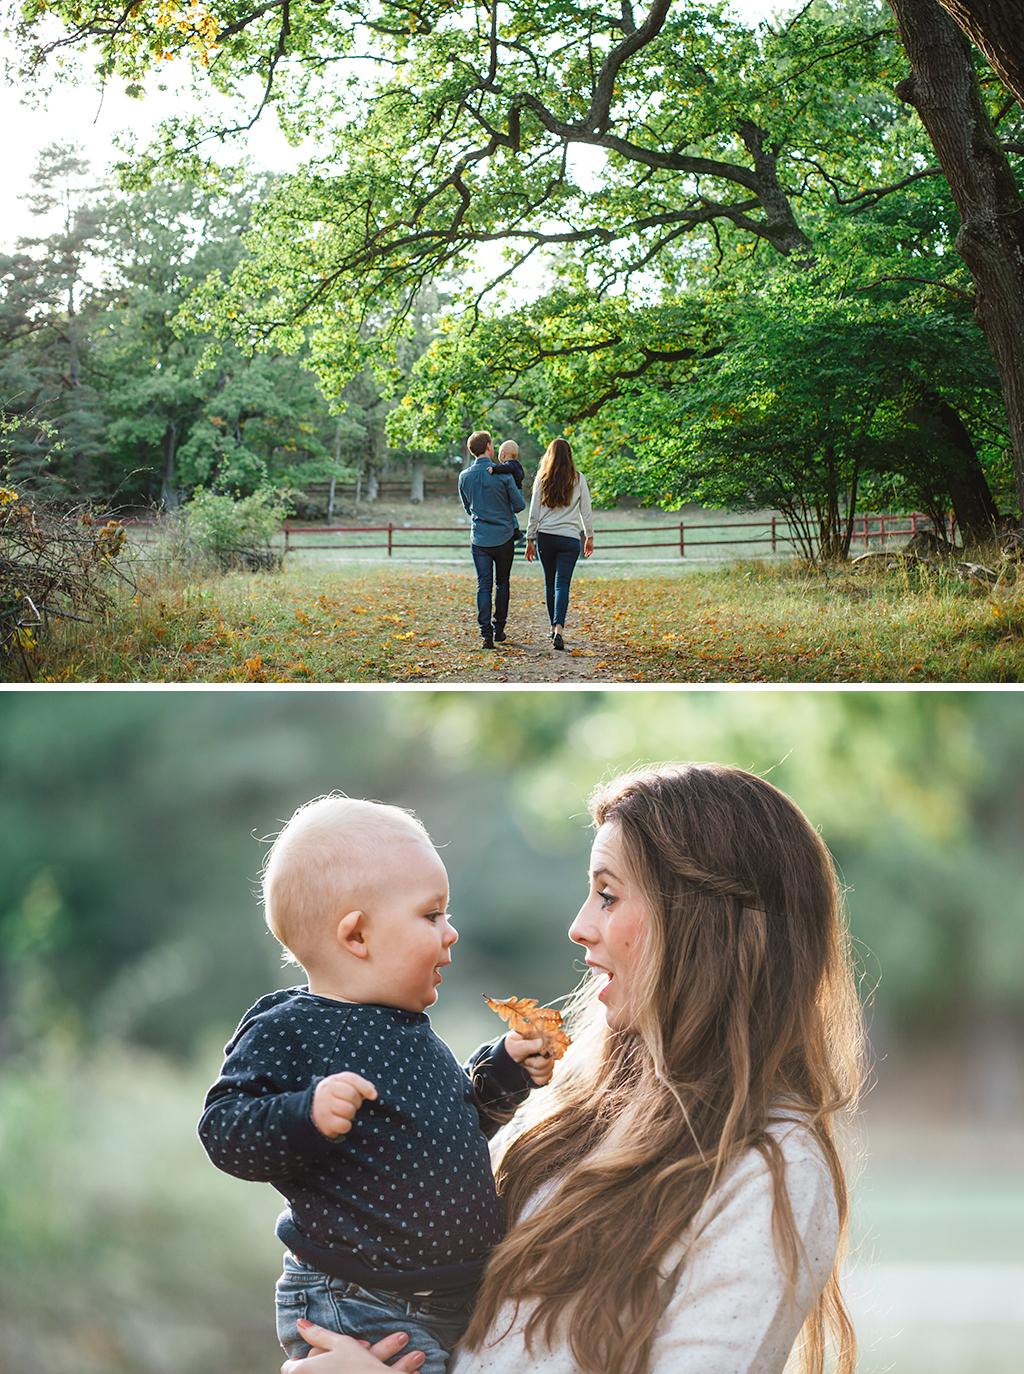 Familjefotografering_Stockholm_Familjefotograf-Anna-Sandstrom_55.jpg